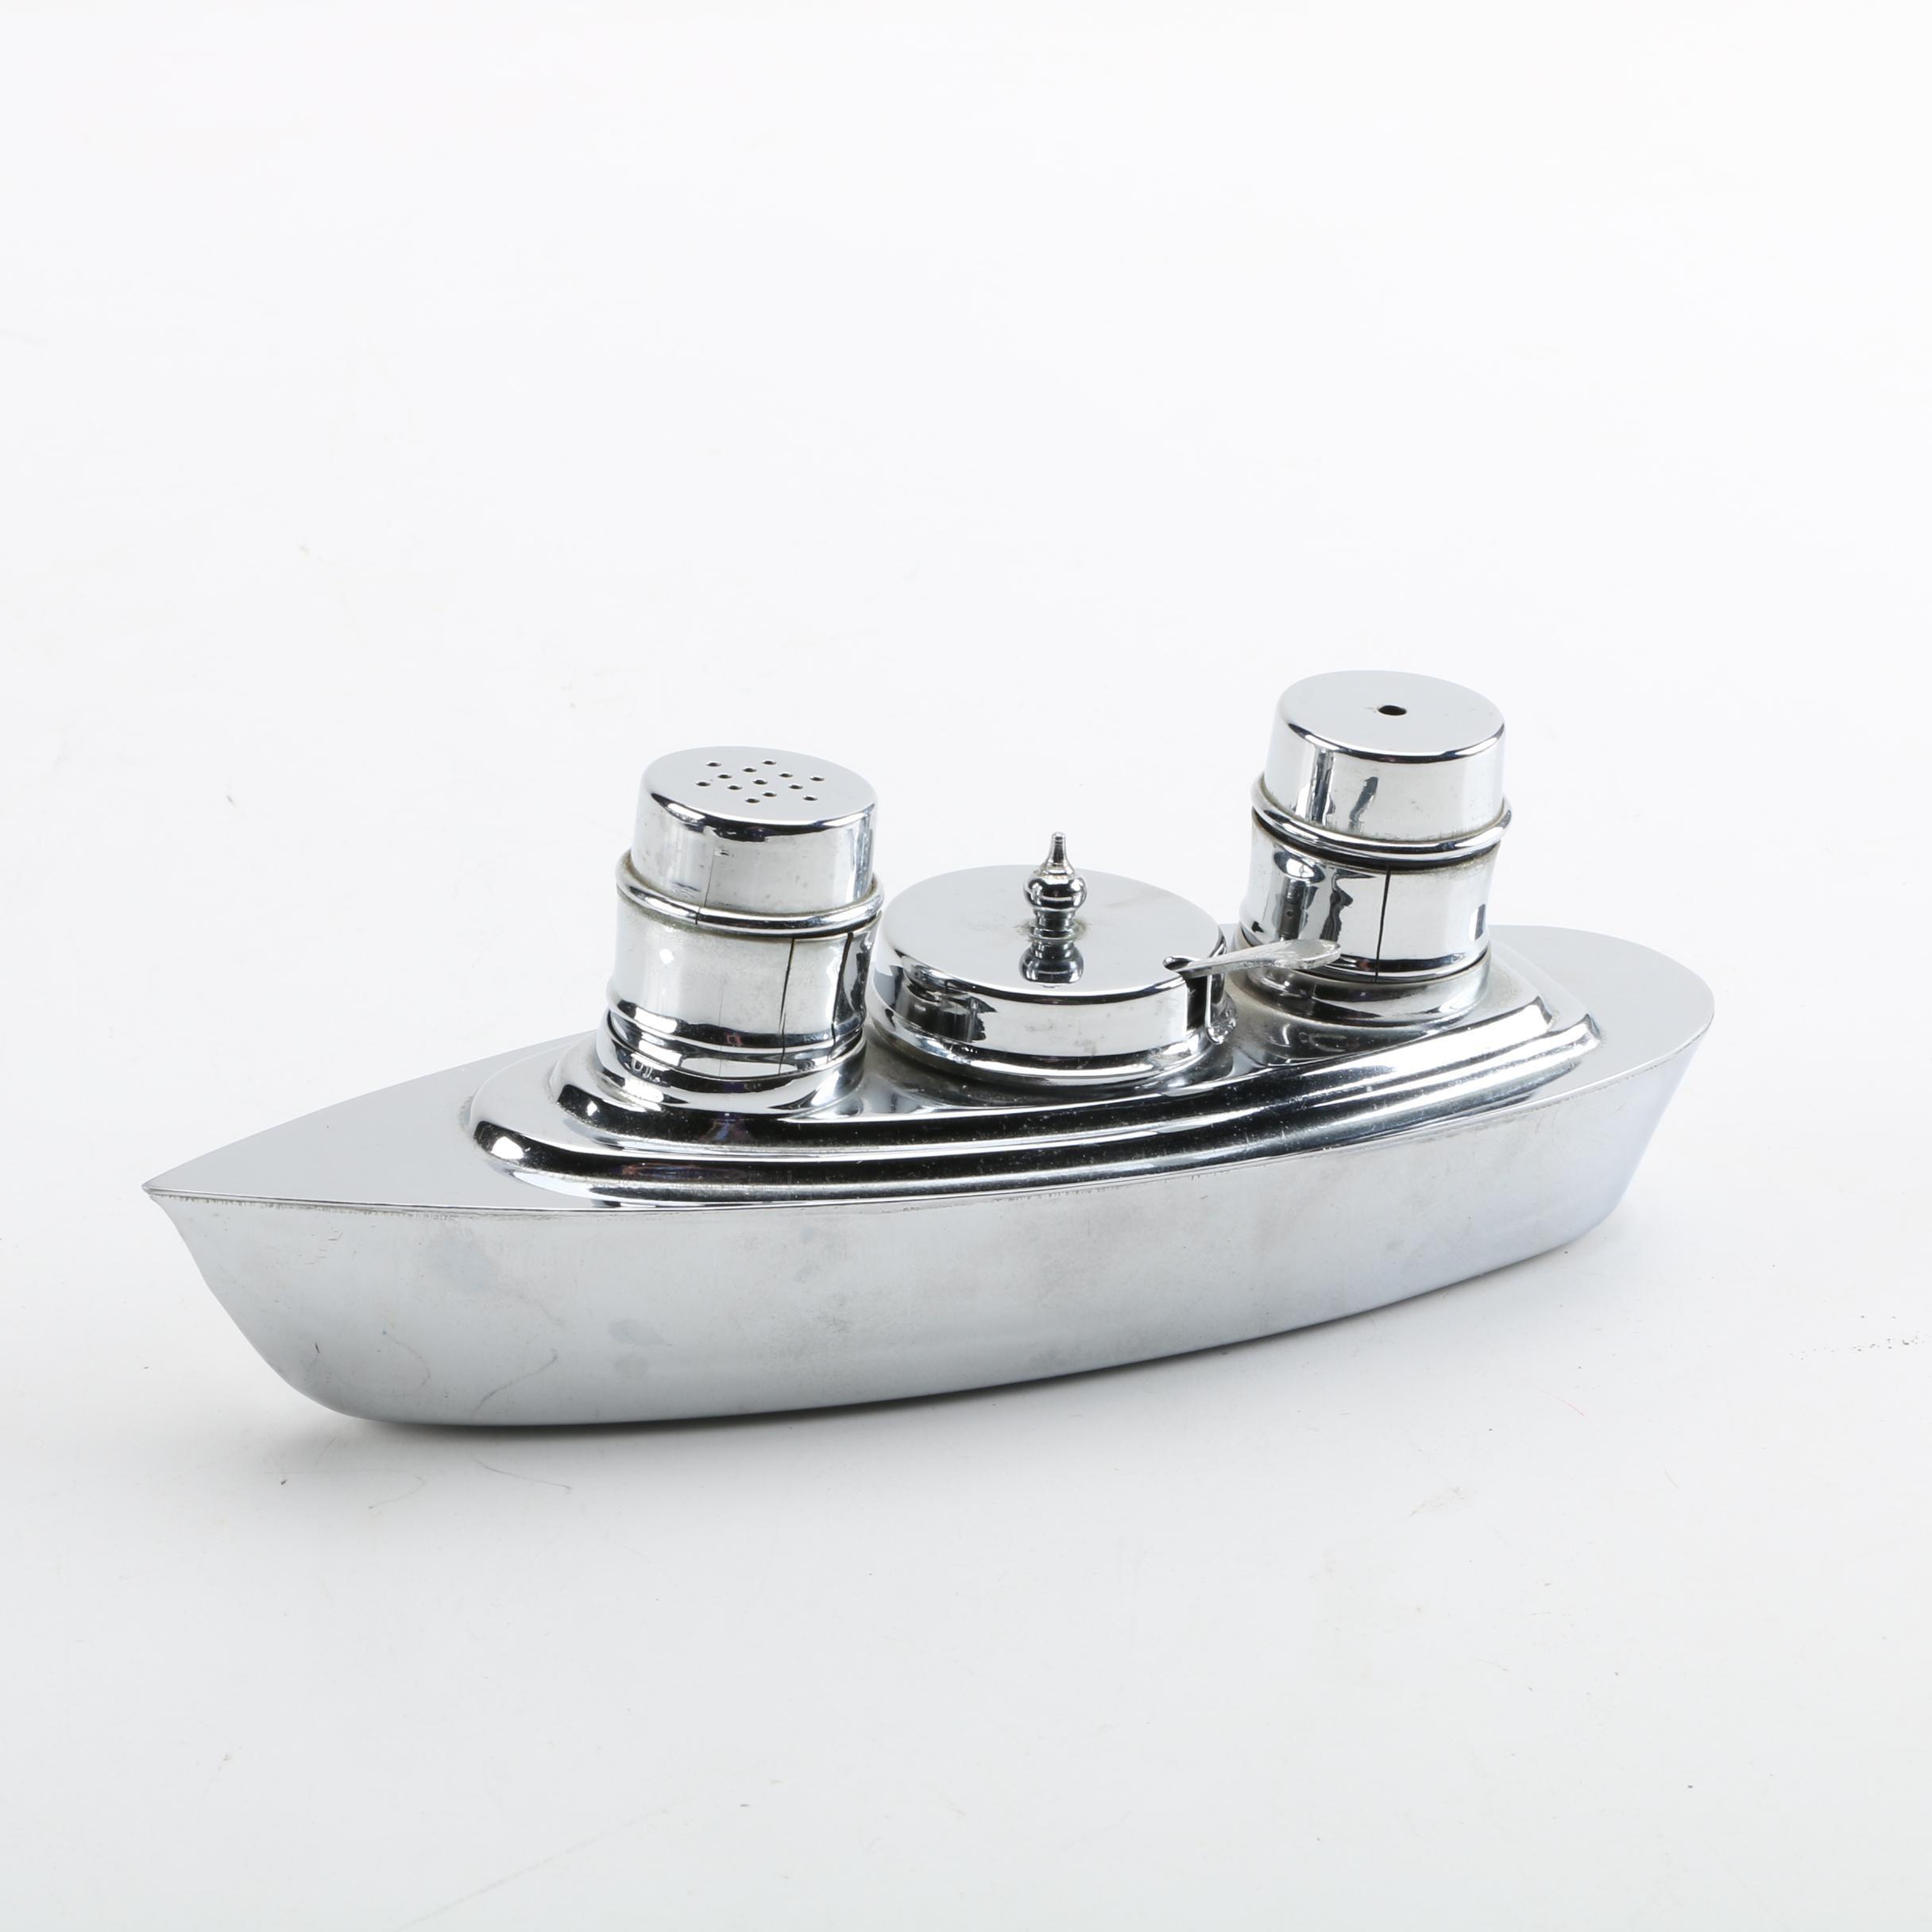 Art Deco Chromed Metal Ocean Liner Condiment Set